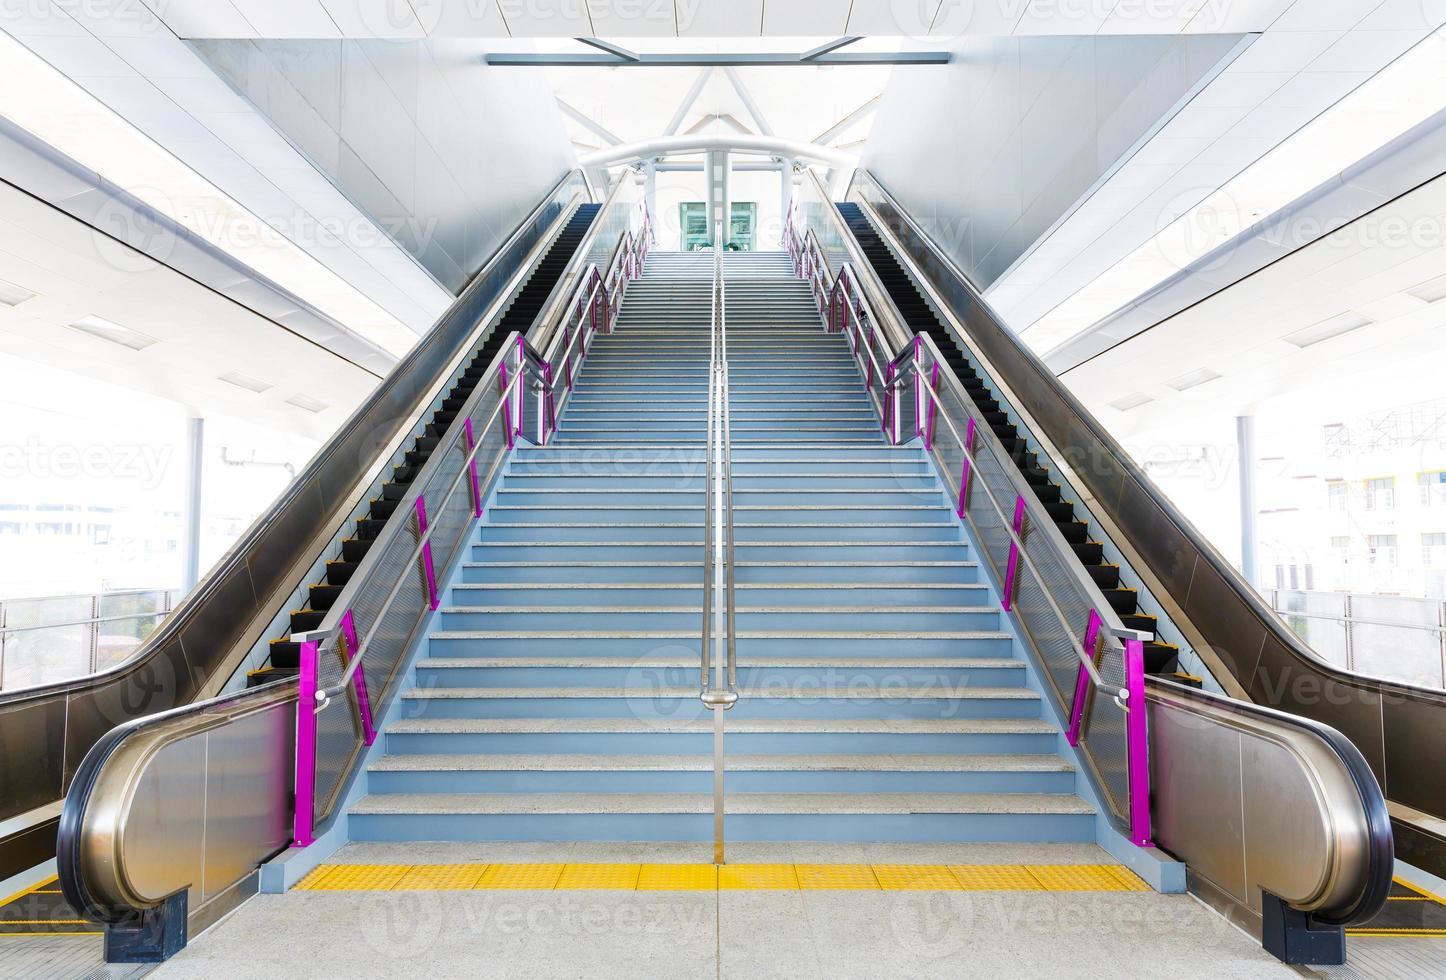 escalator et escaliers photo